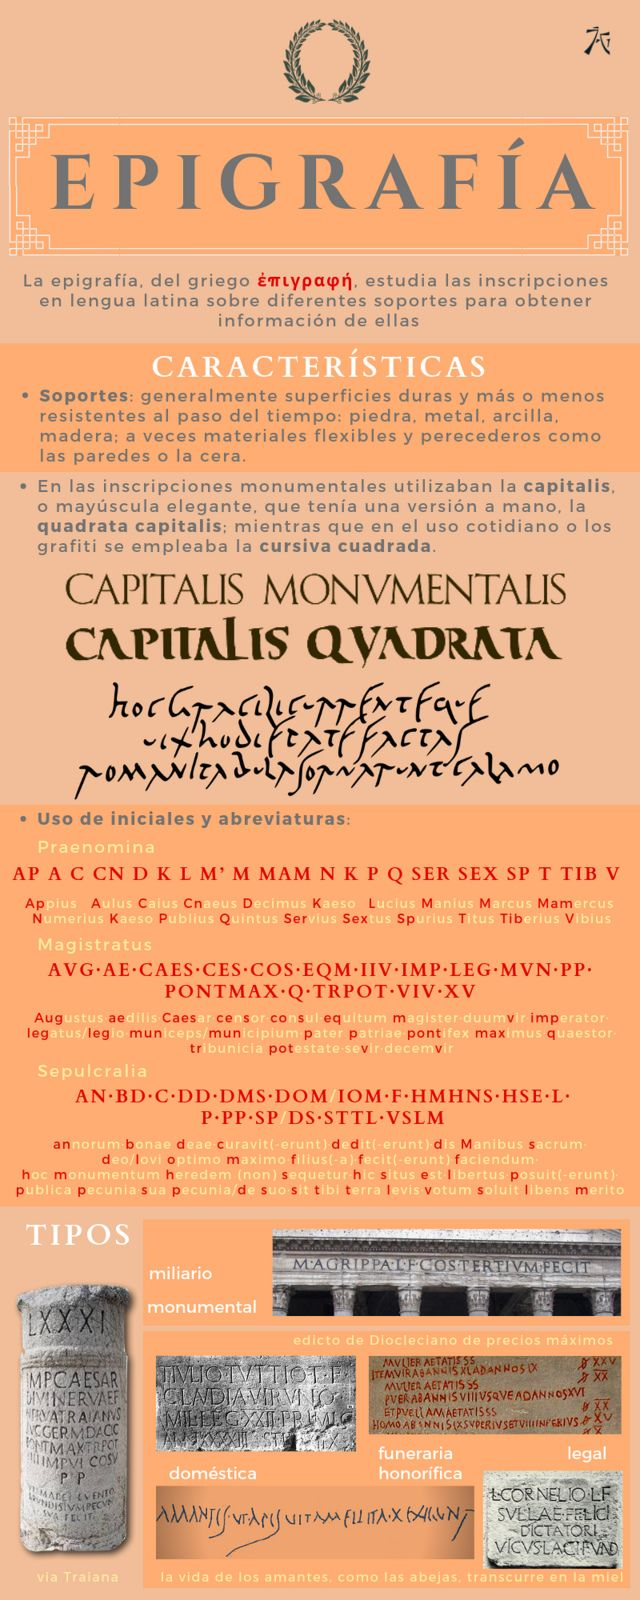 Cl Epigrafia Con Imagenes Infografia Lengua Latina Cursiva